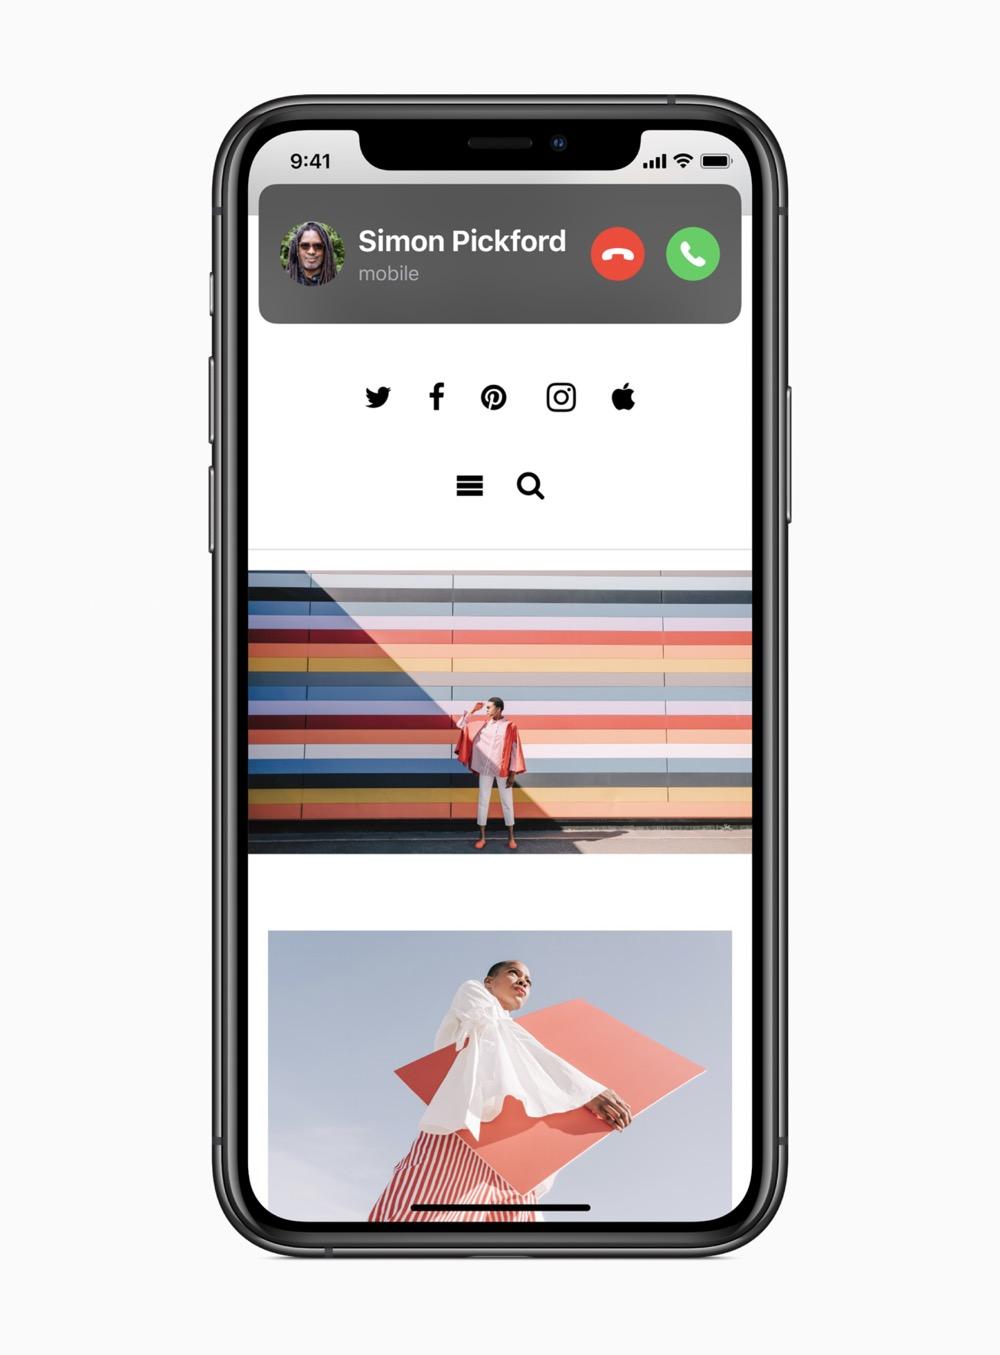 Apple ios14 incoming call screen 06222020